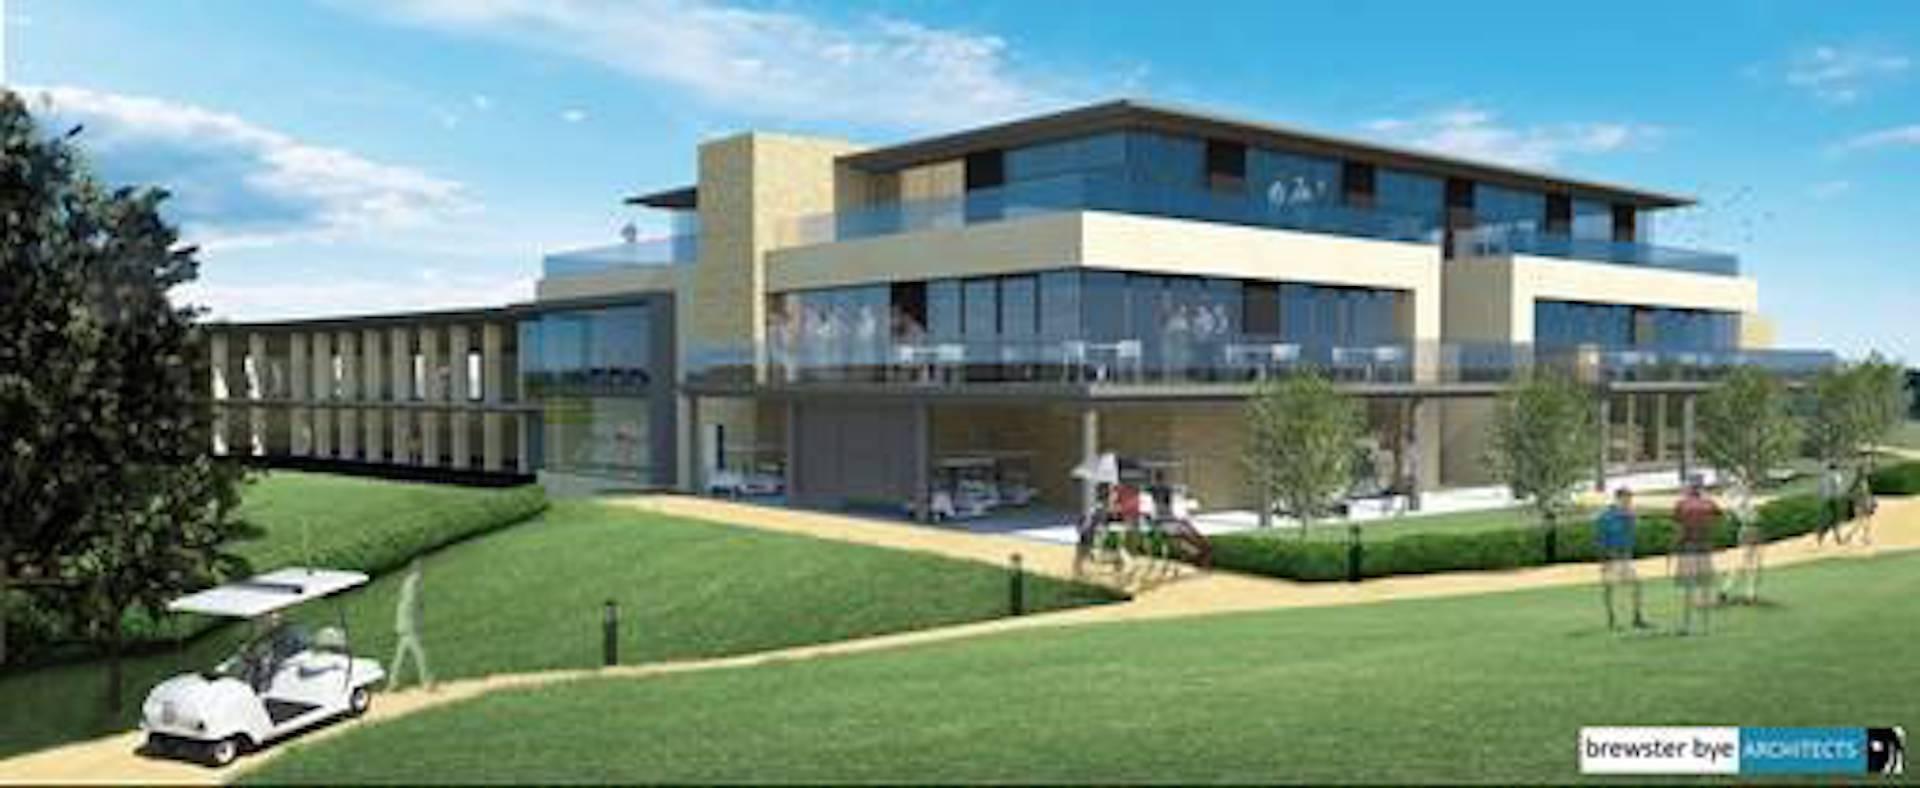 Leeds Golf Centre starts £9 million expansion process